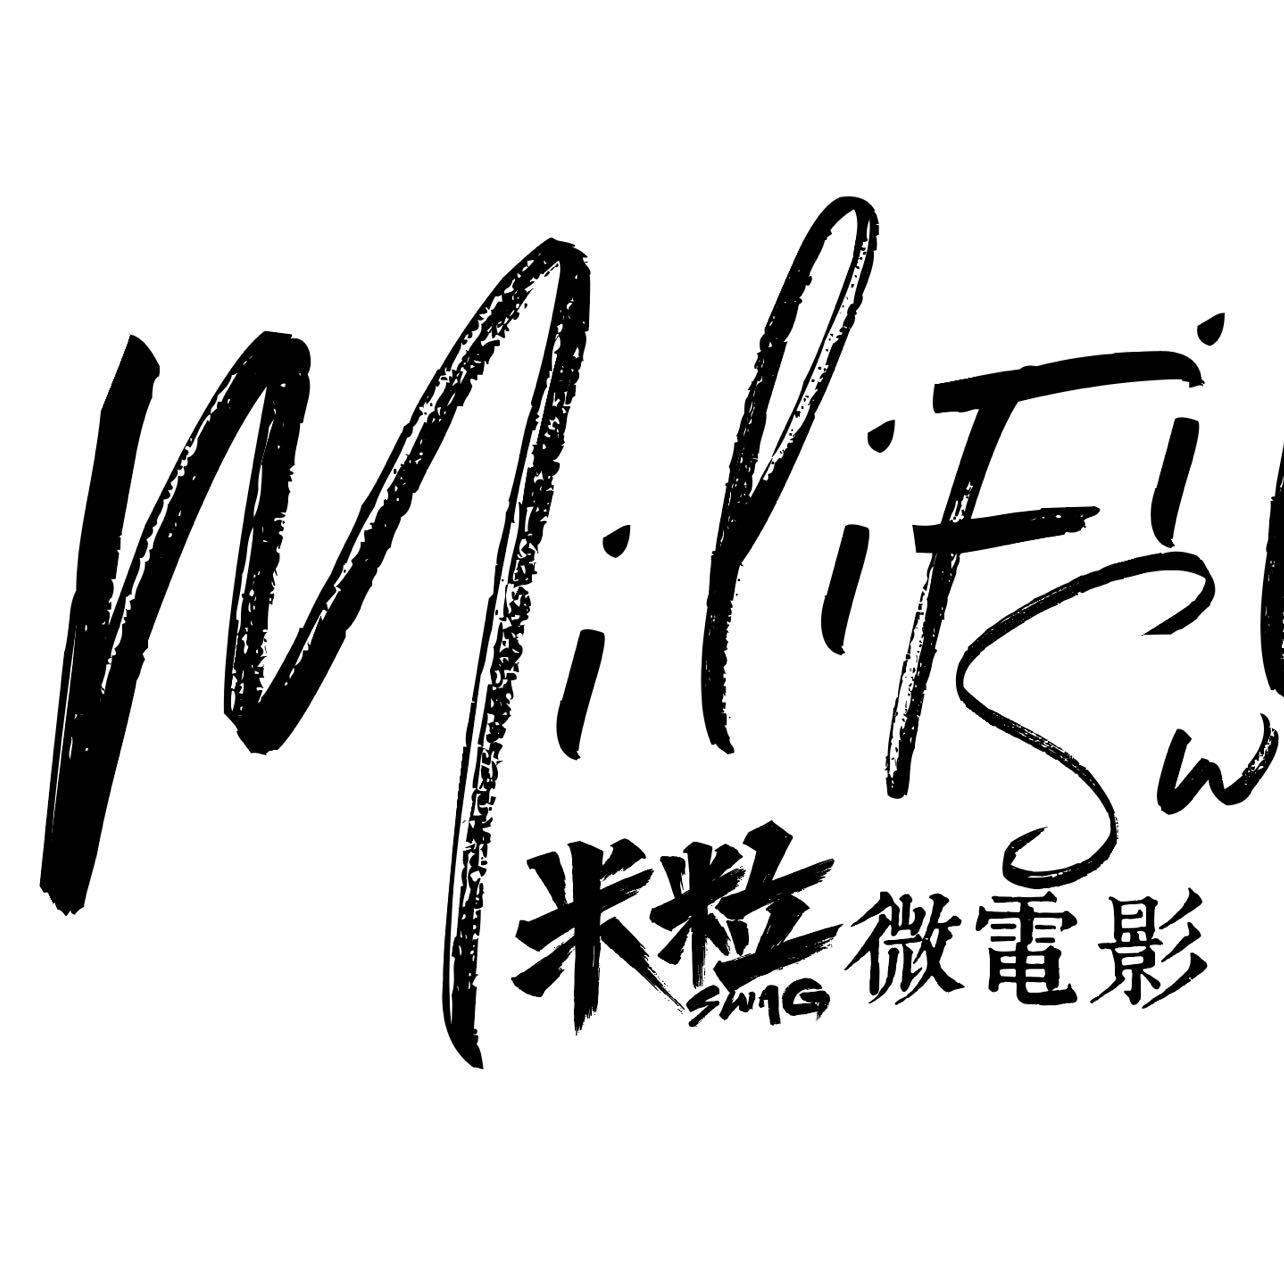 米粒微电影Studio